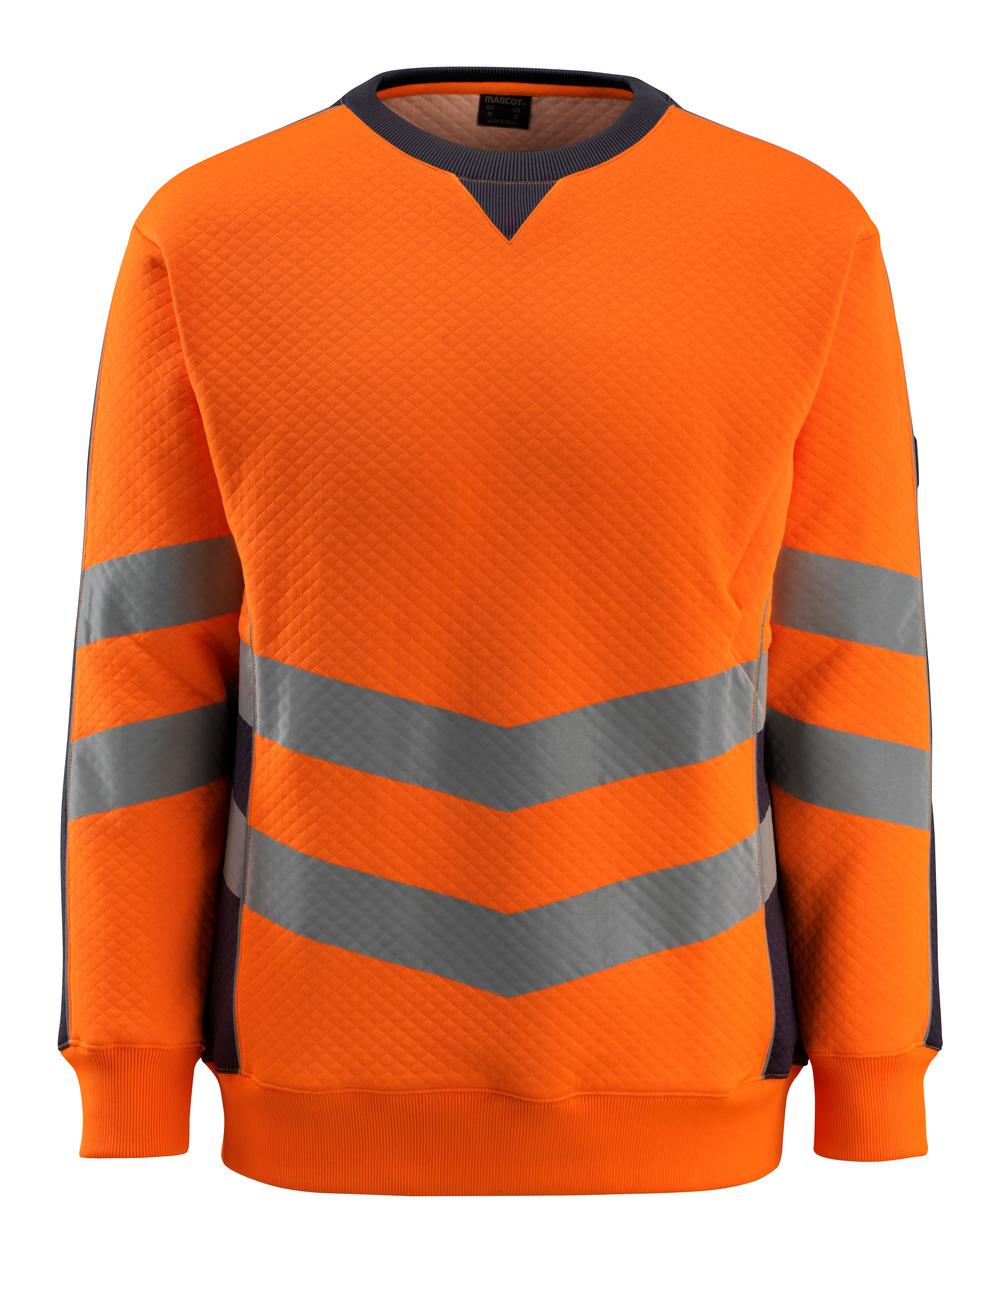 50126-932-14010 Sudadera - naranja de alta vis./azul marino oscuro